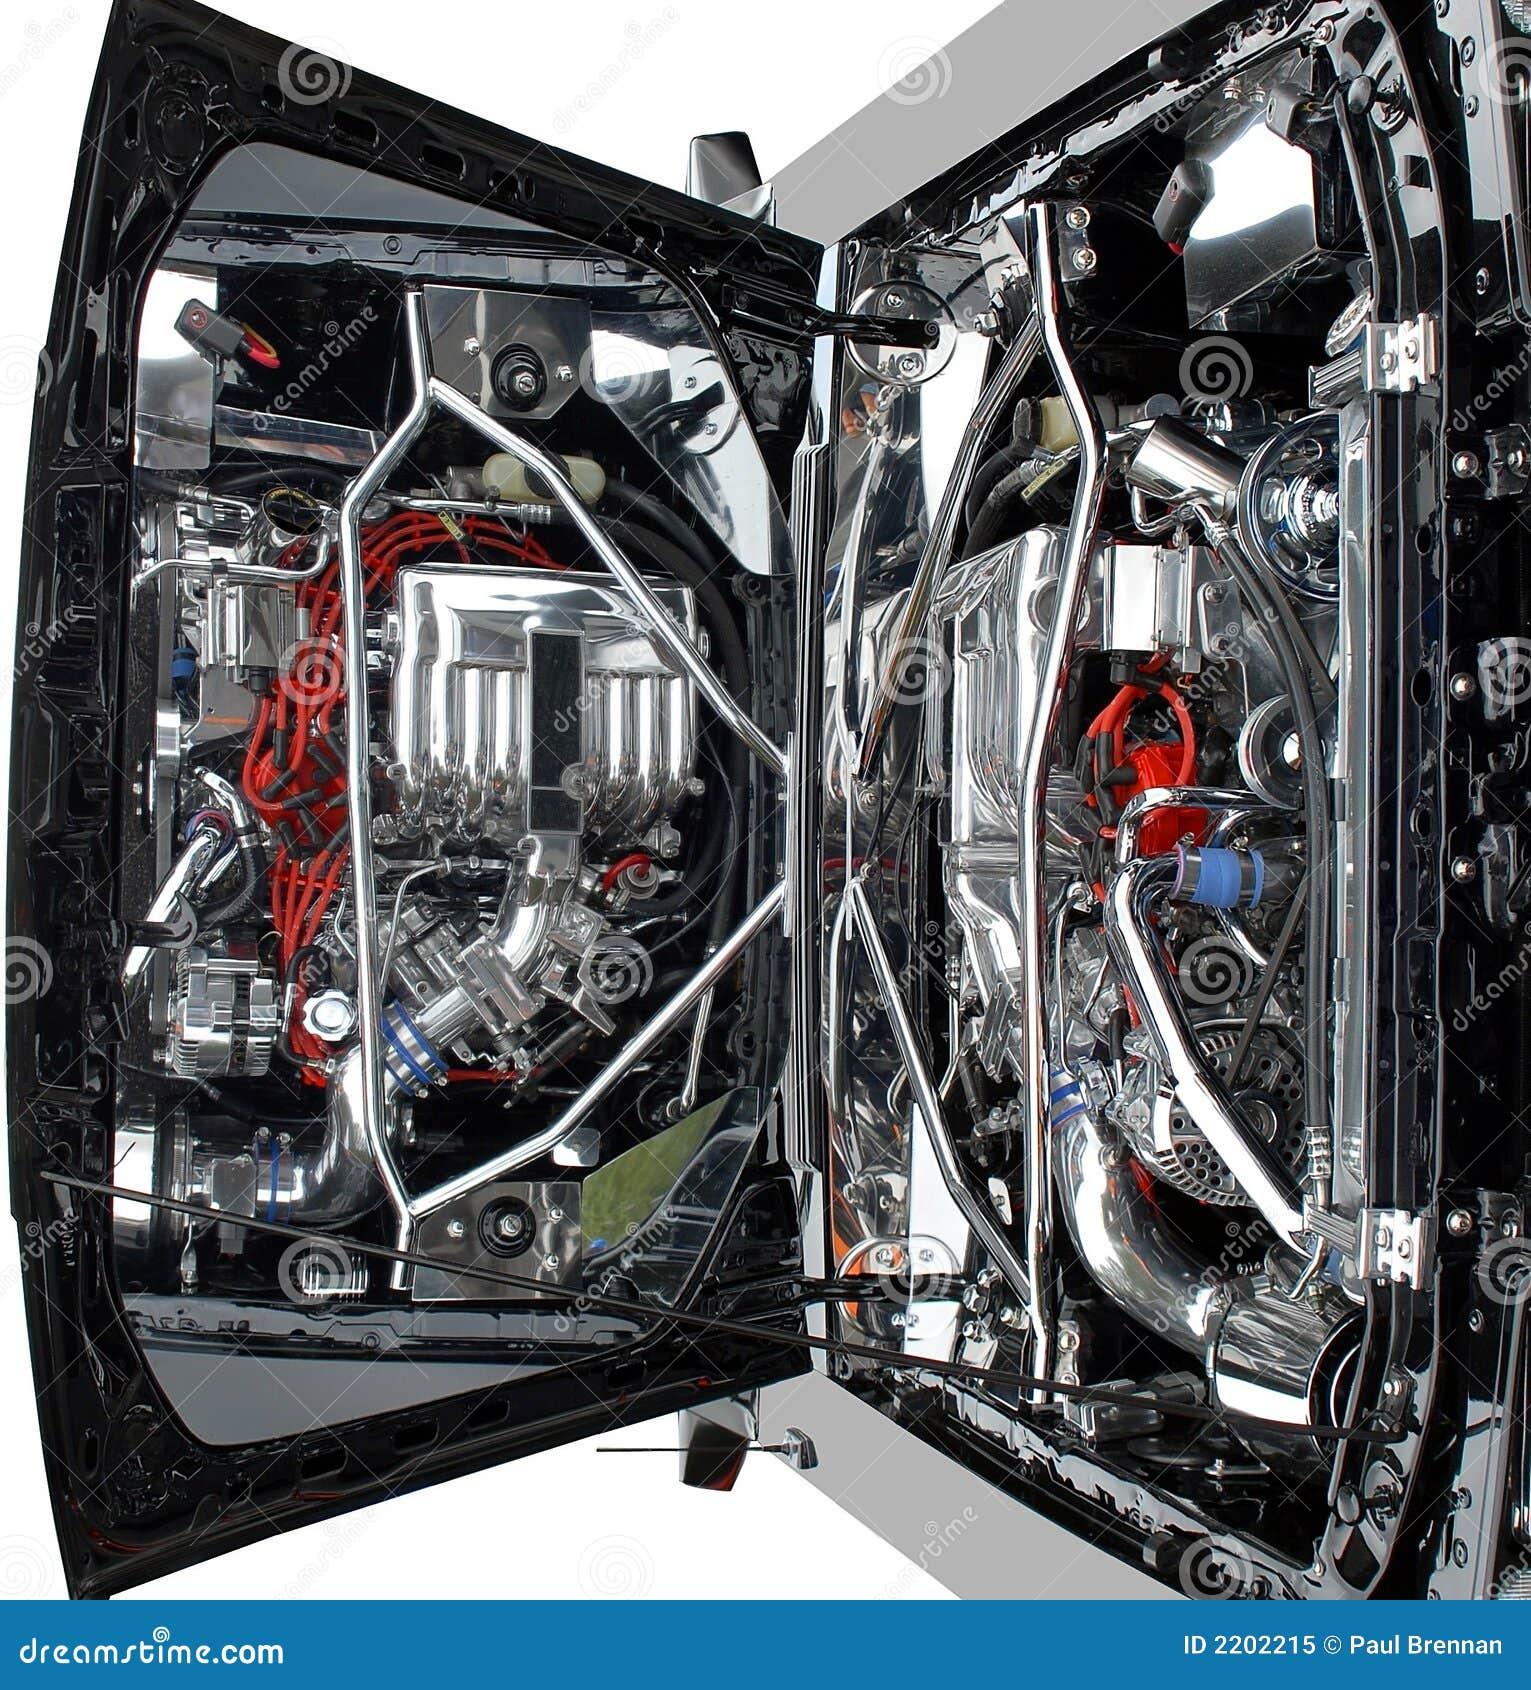 Auto-Motor stockbild. Bild von funken, teile, kraftstoff - 2202215